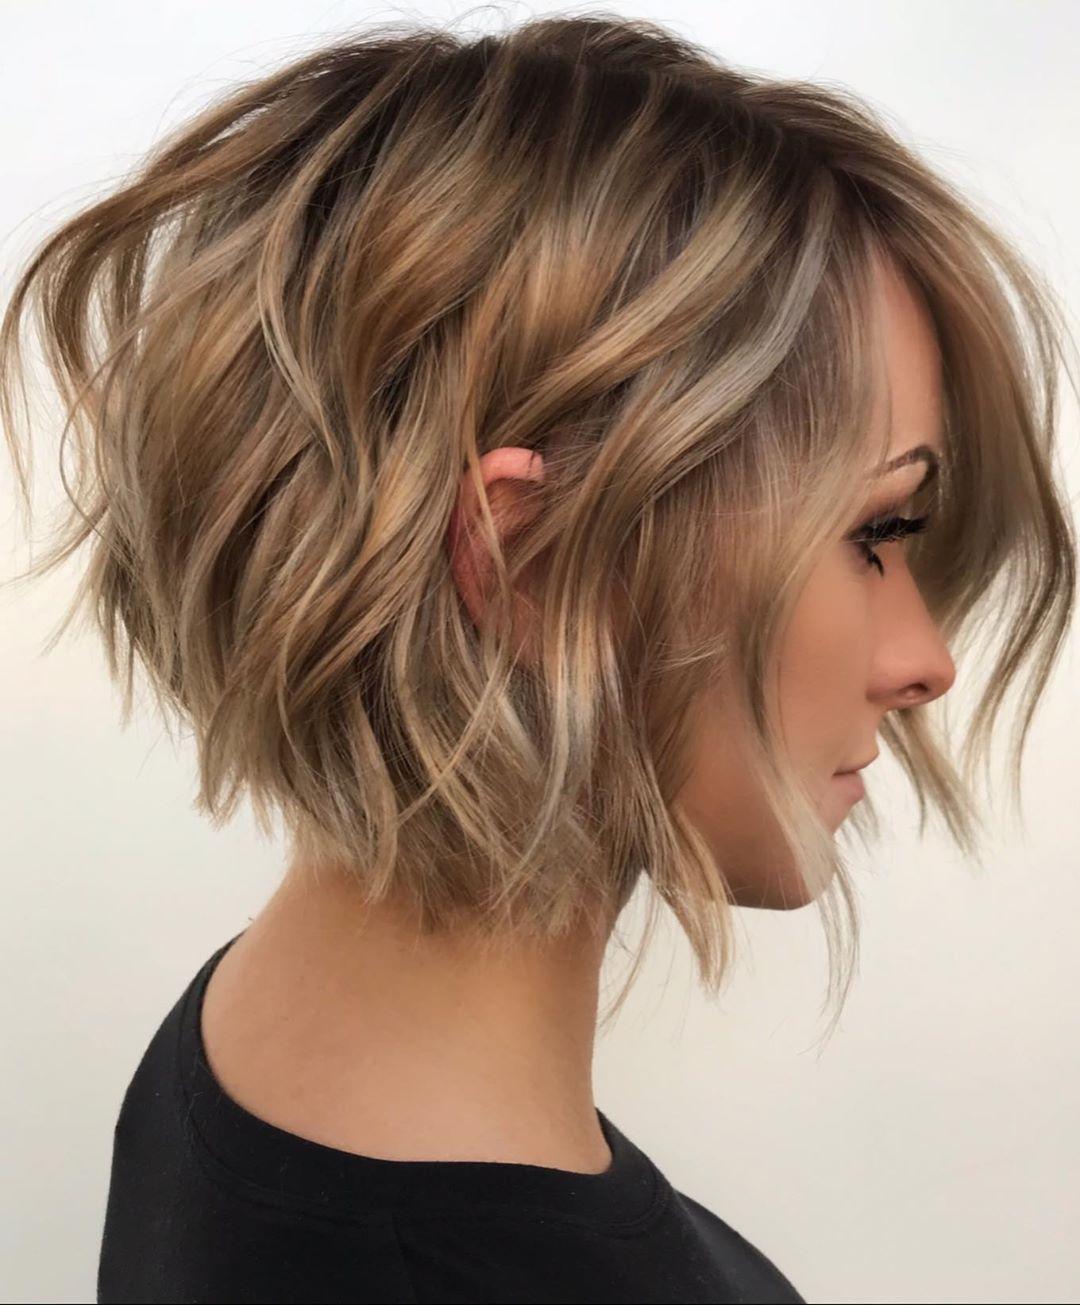 причёски для коротких волос фото 3